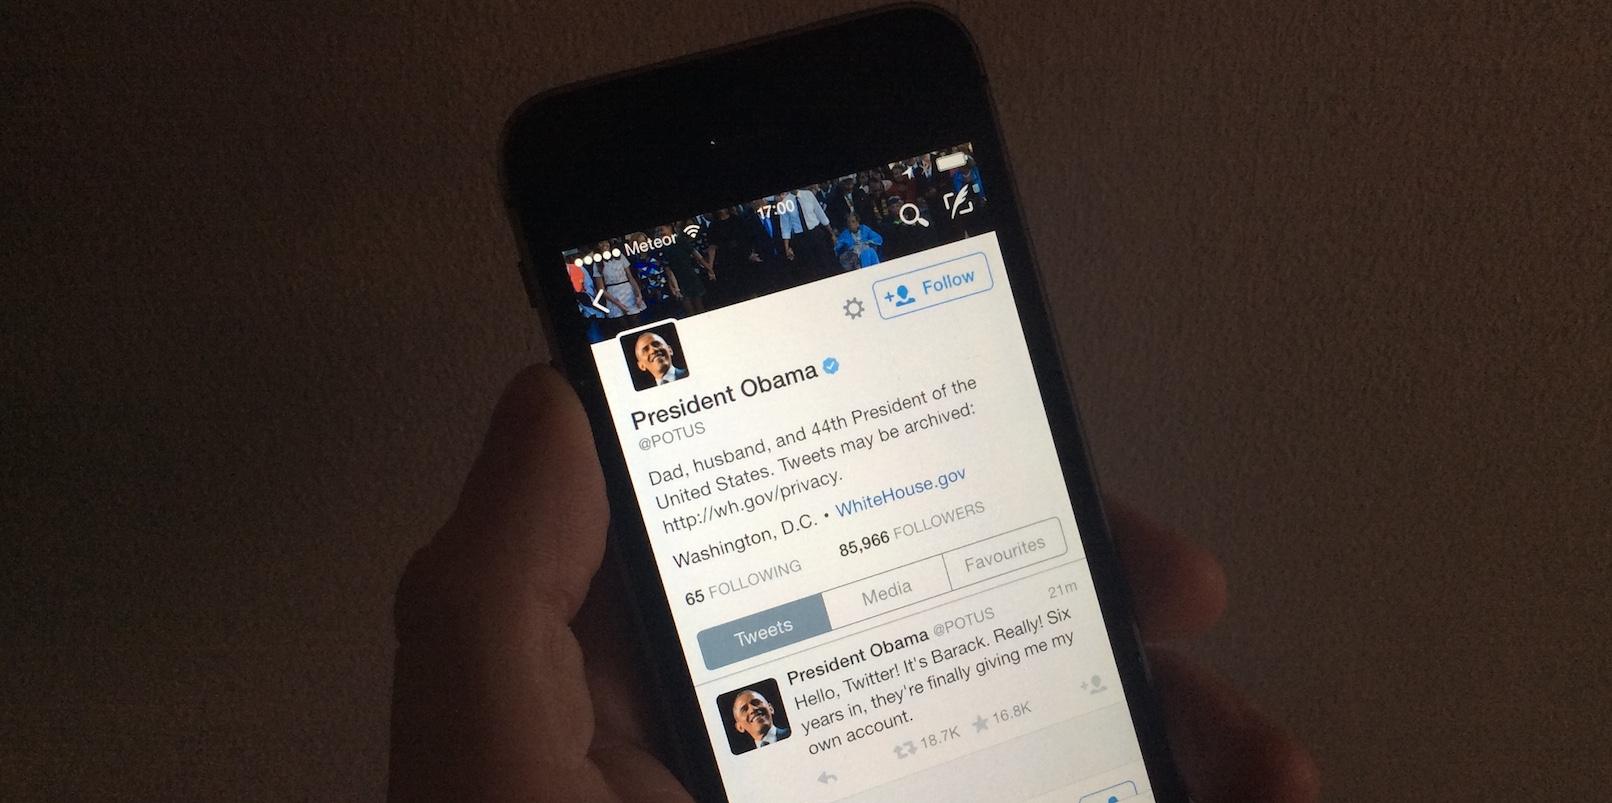 President Obama joins Twitter for real